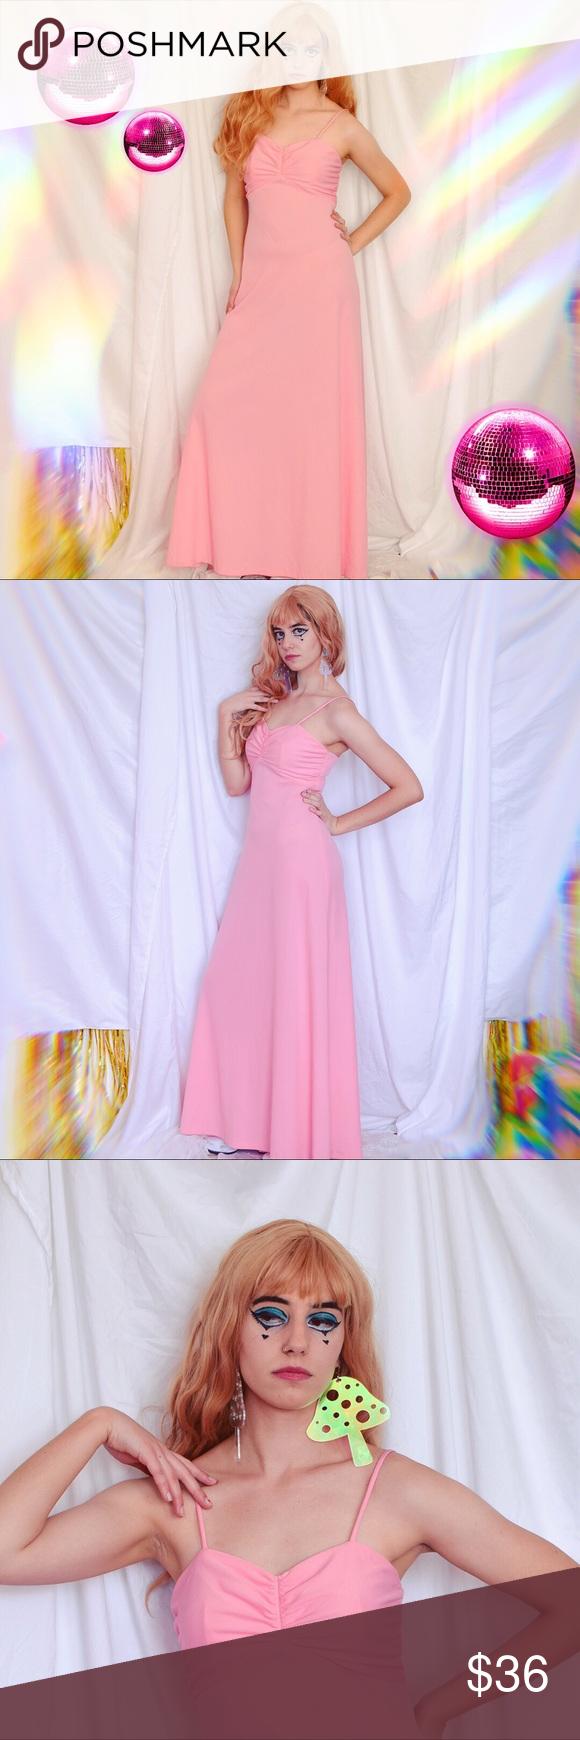 S stewpot pink prom dress babydoll top vintage my posh closet